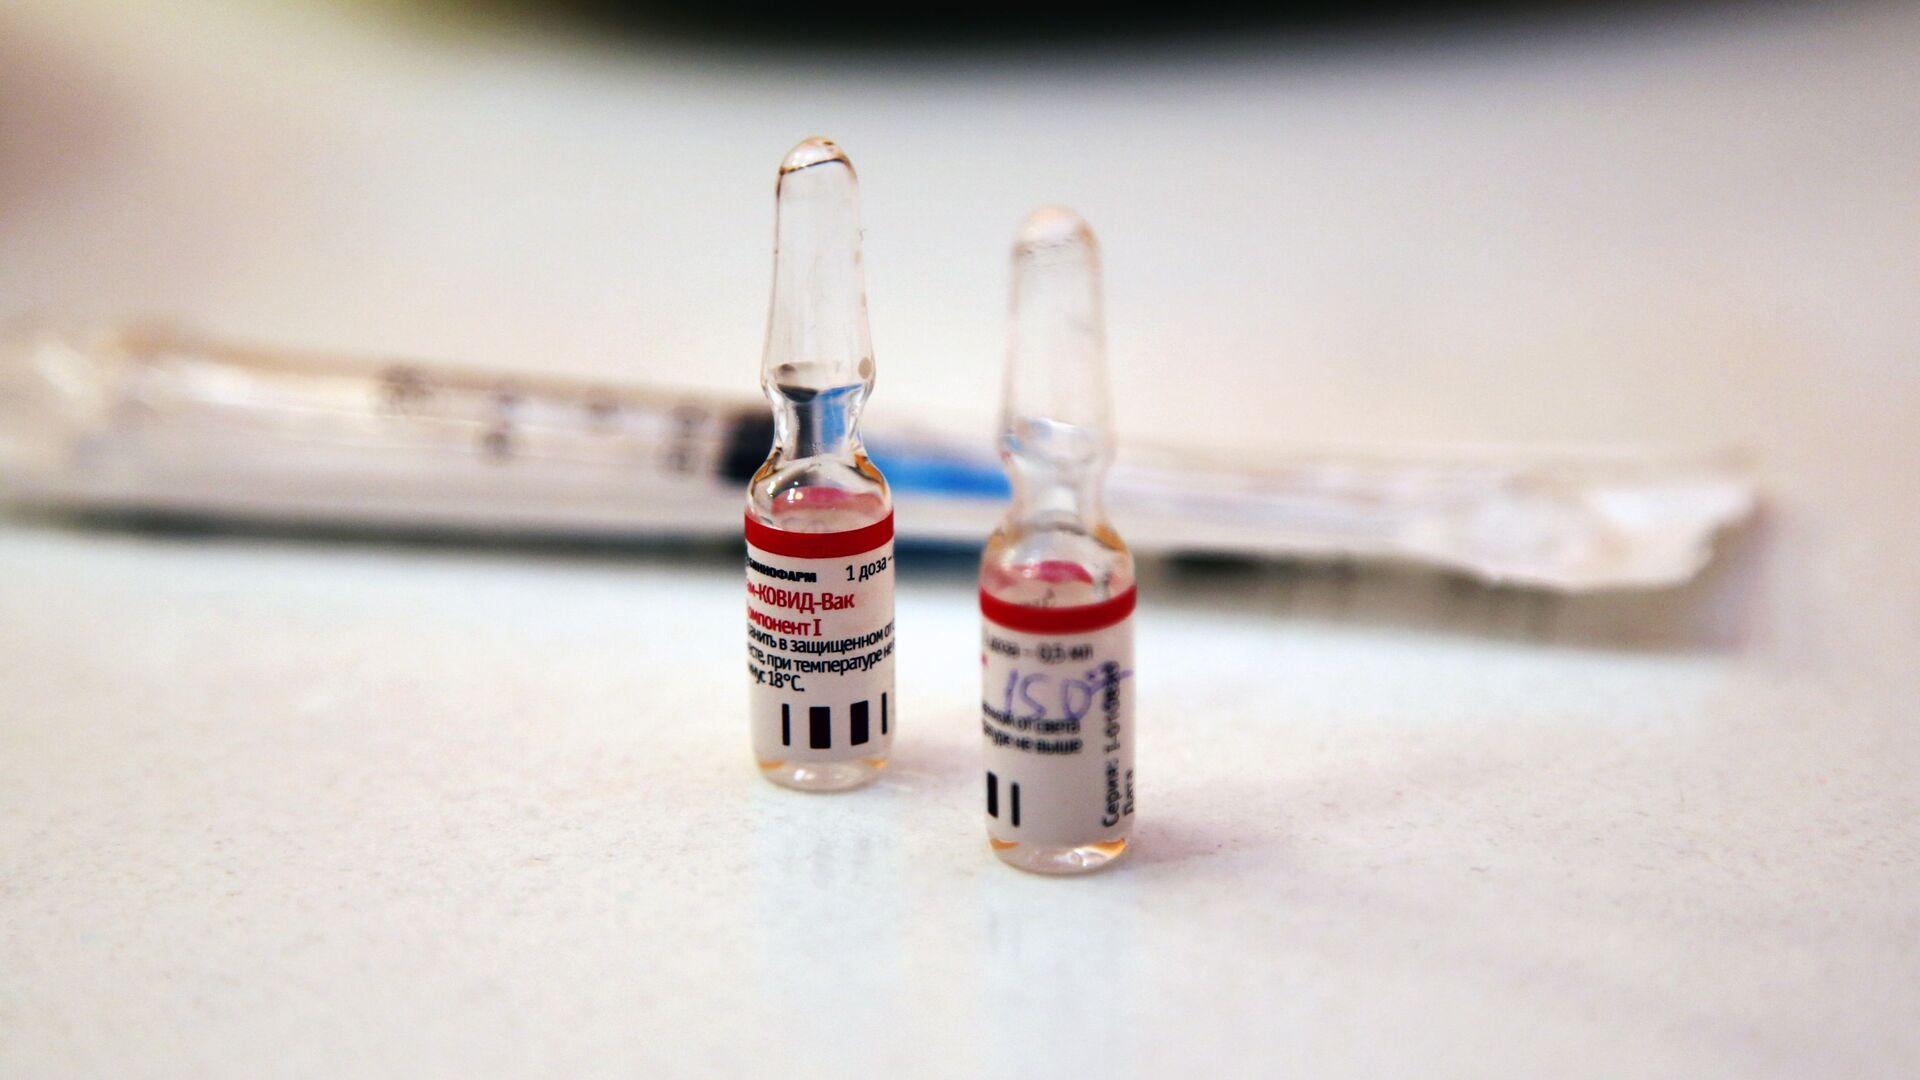 Vacuna rusa contra el coronavirus Sputnik V - Sputnik Mundo, 1920, 04.02.2021